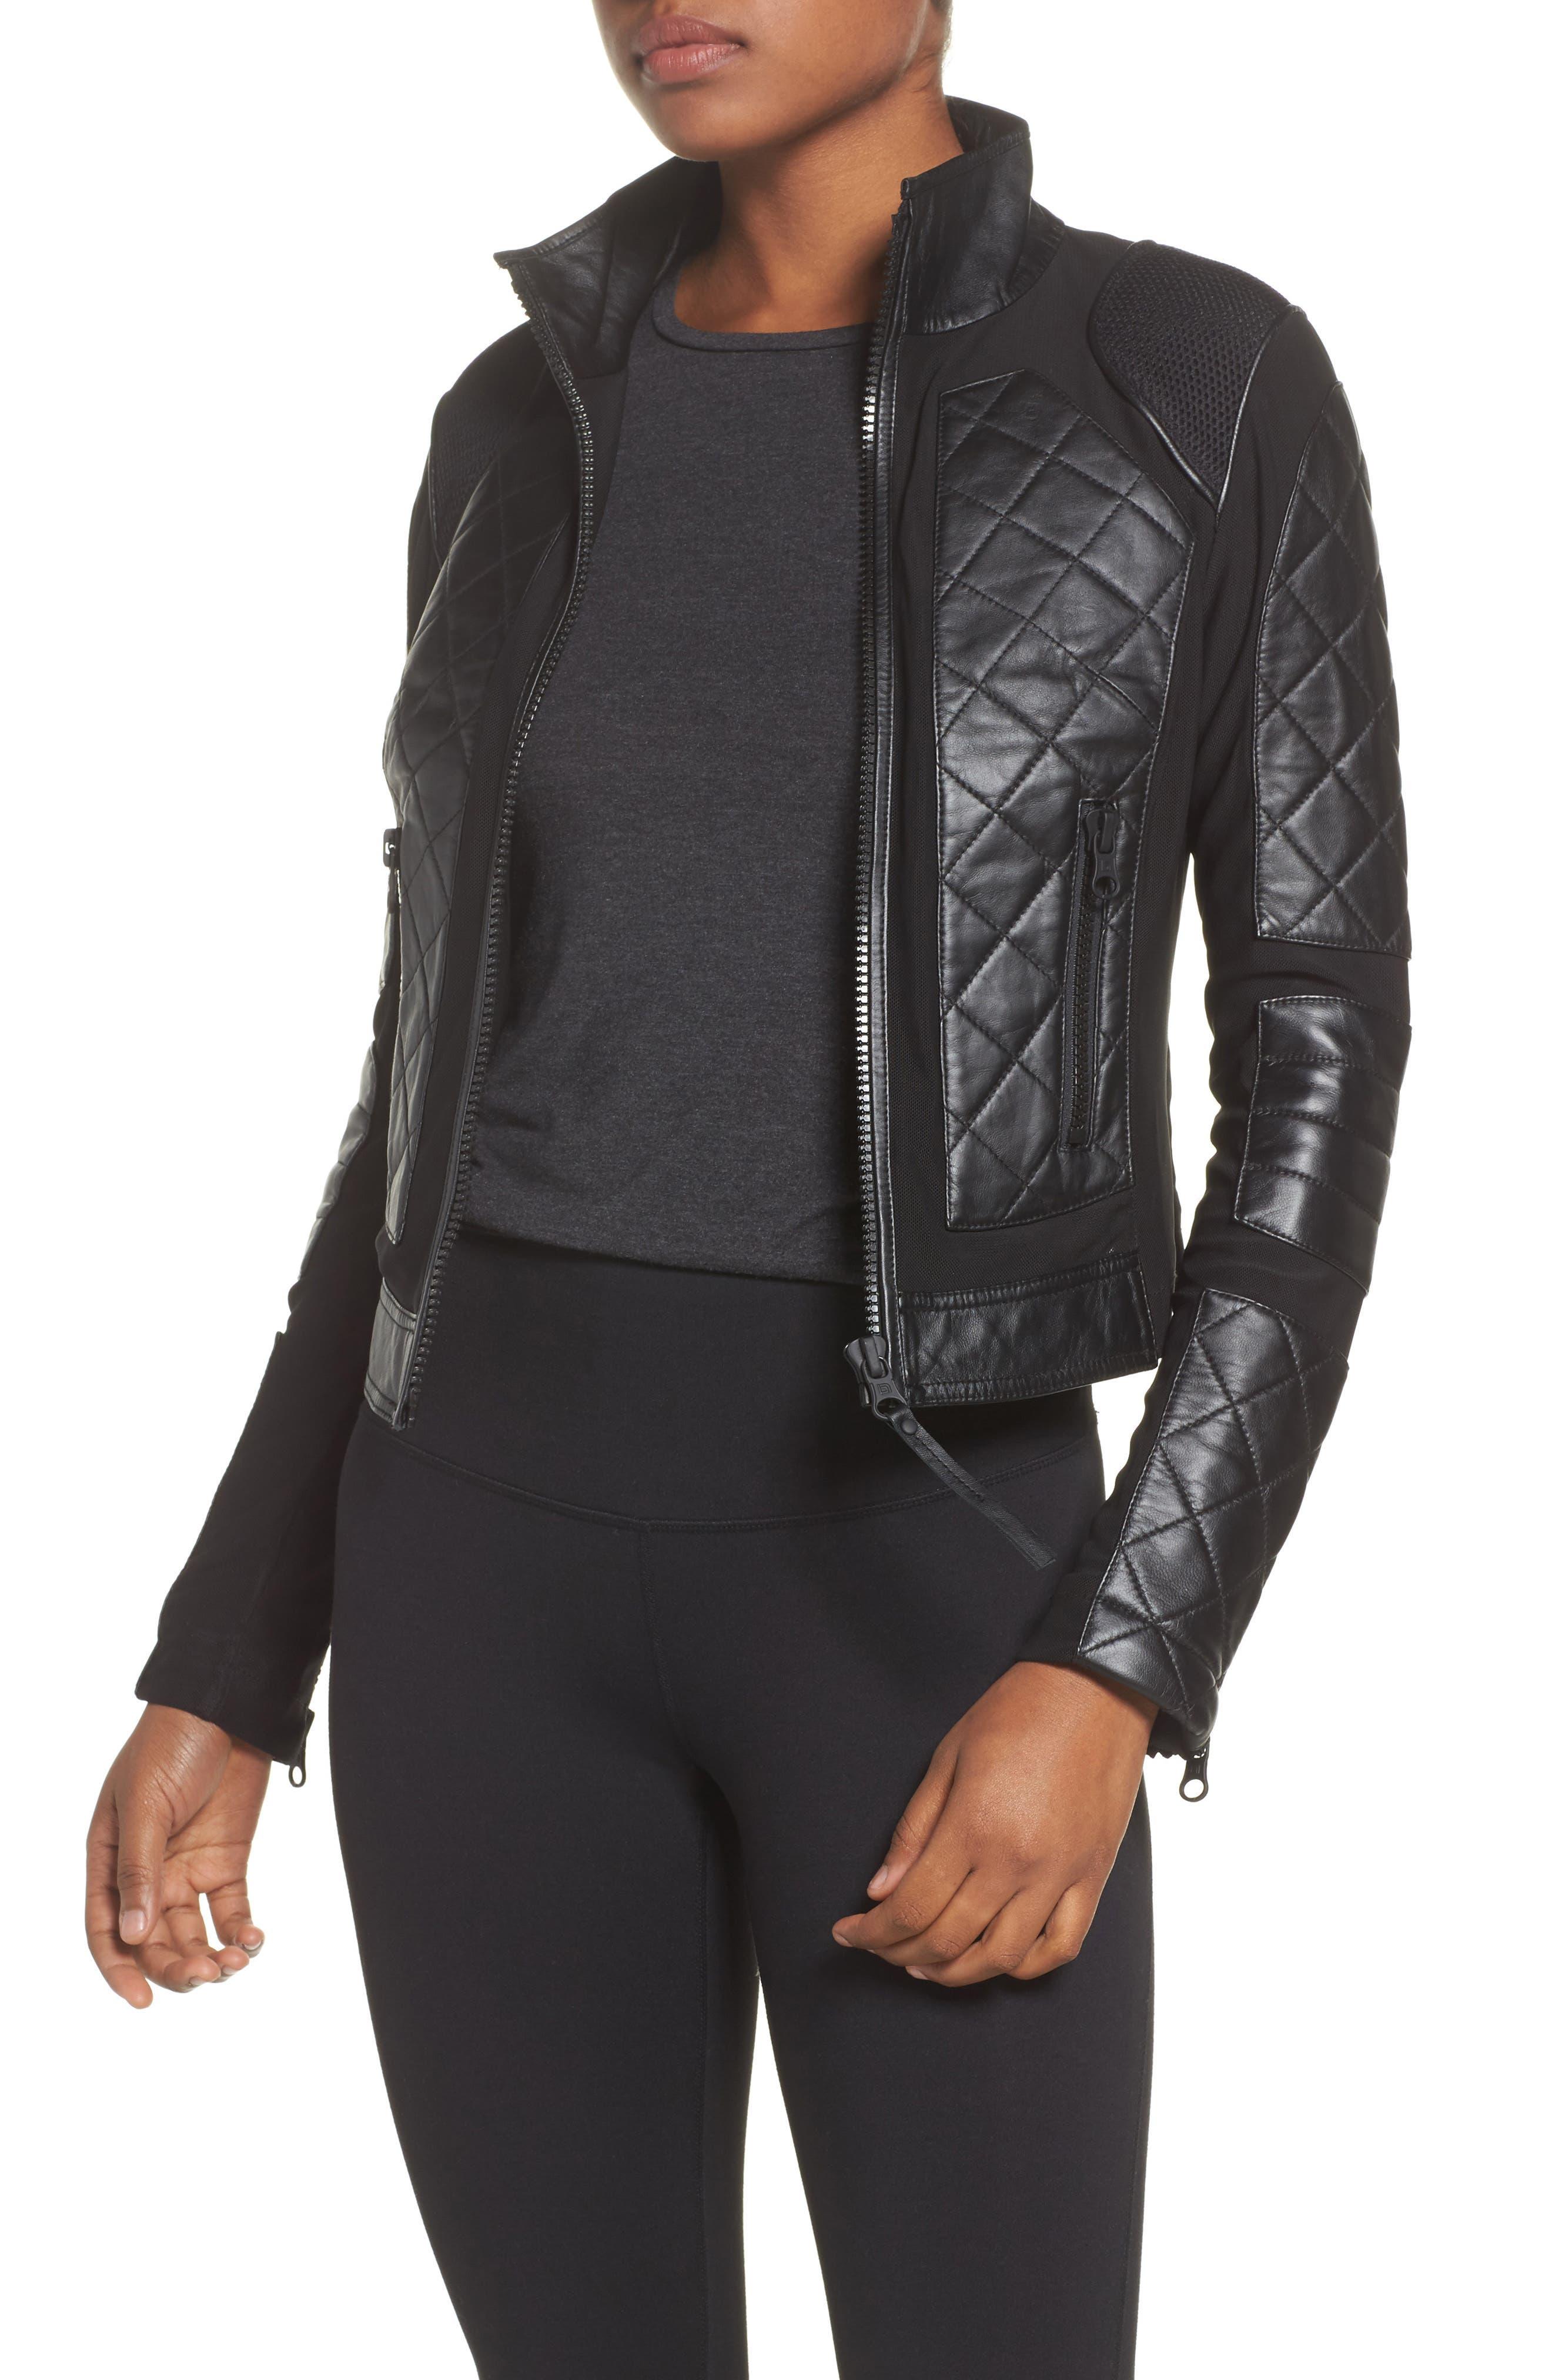 BLANC NOIR, Leather & Mesh Moto Jacket, Main thumbnail 1, color, BLACK